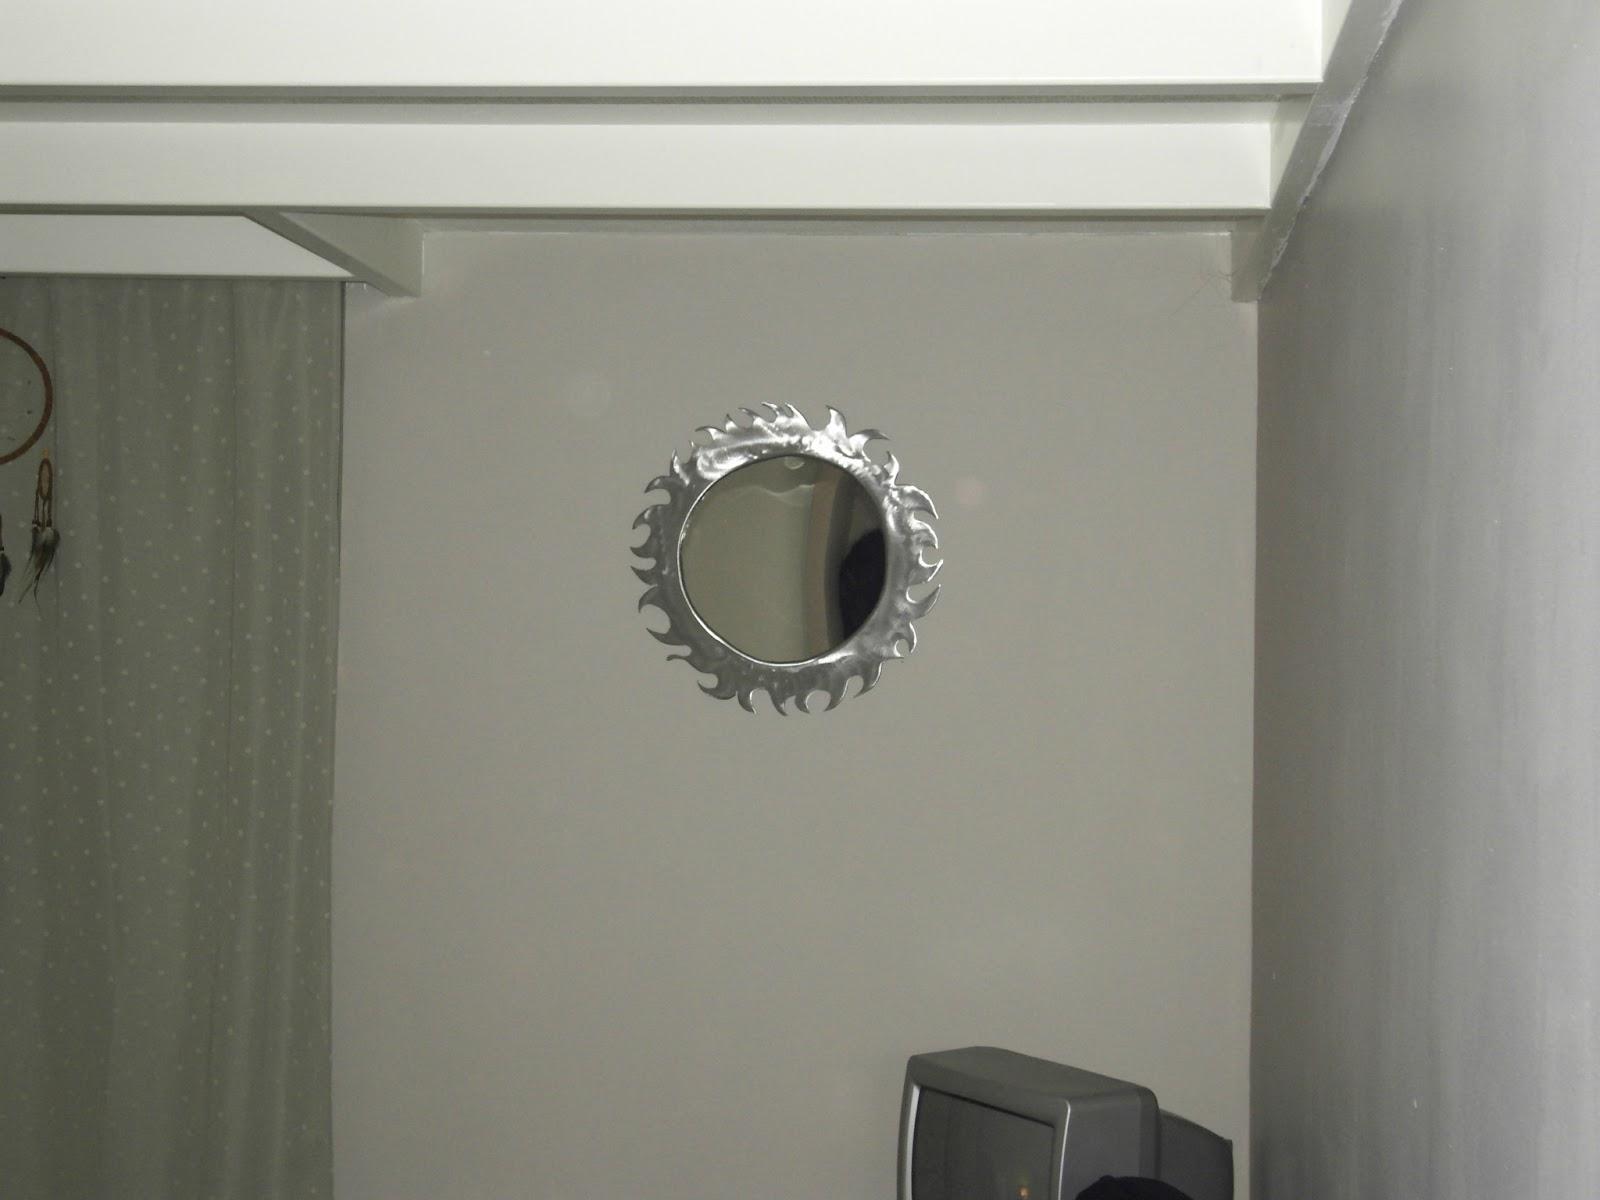 Toto r alisation soleil inox poli miroir for Acier poli miroir